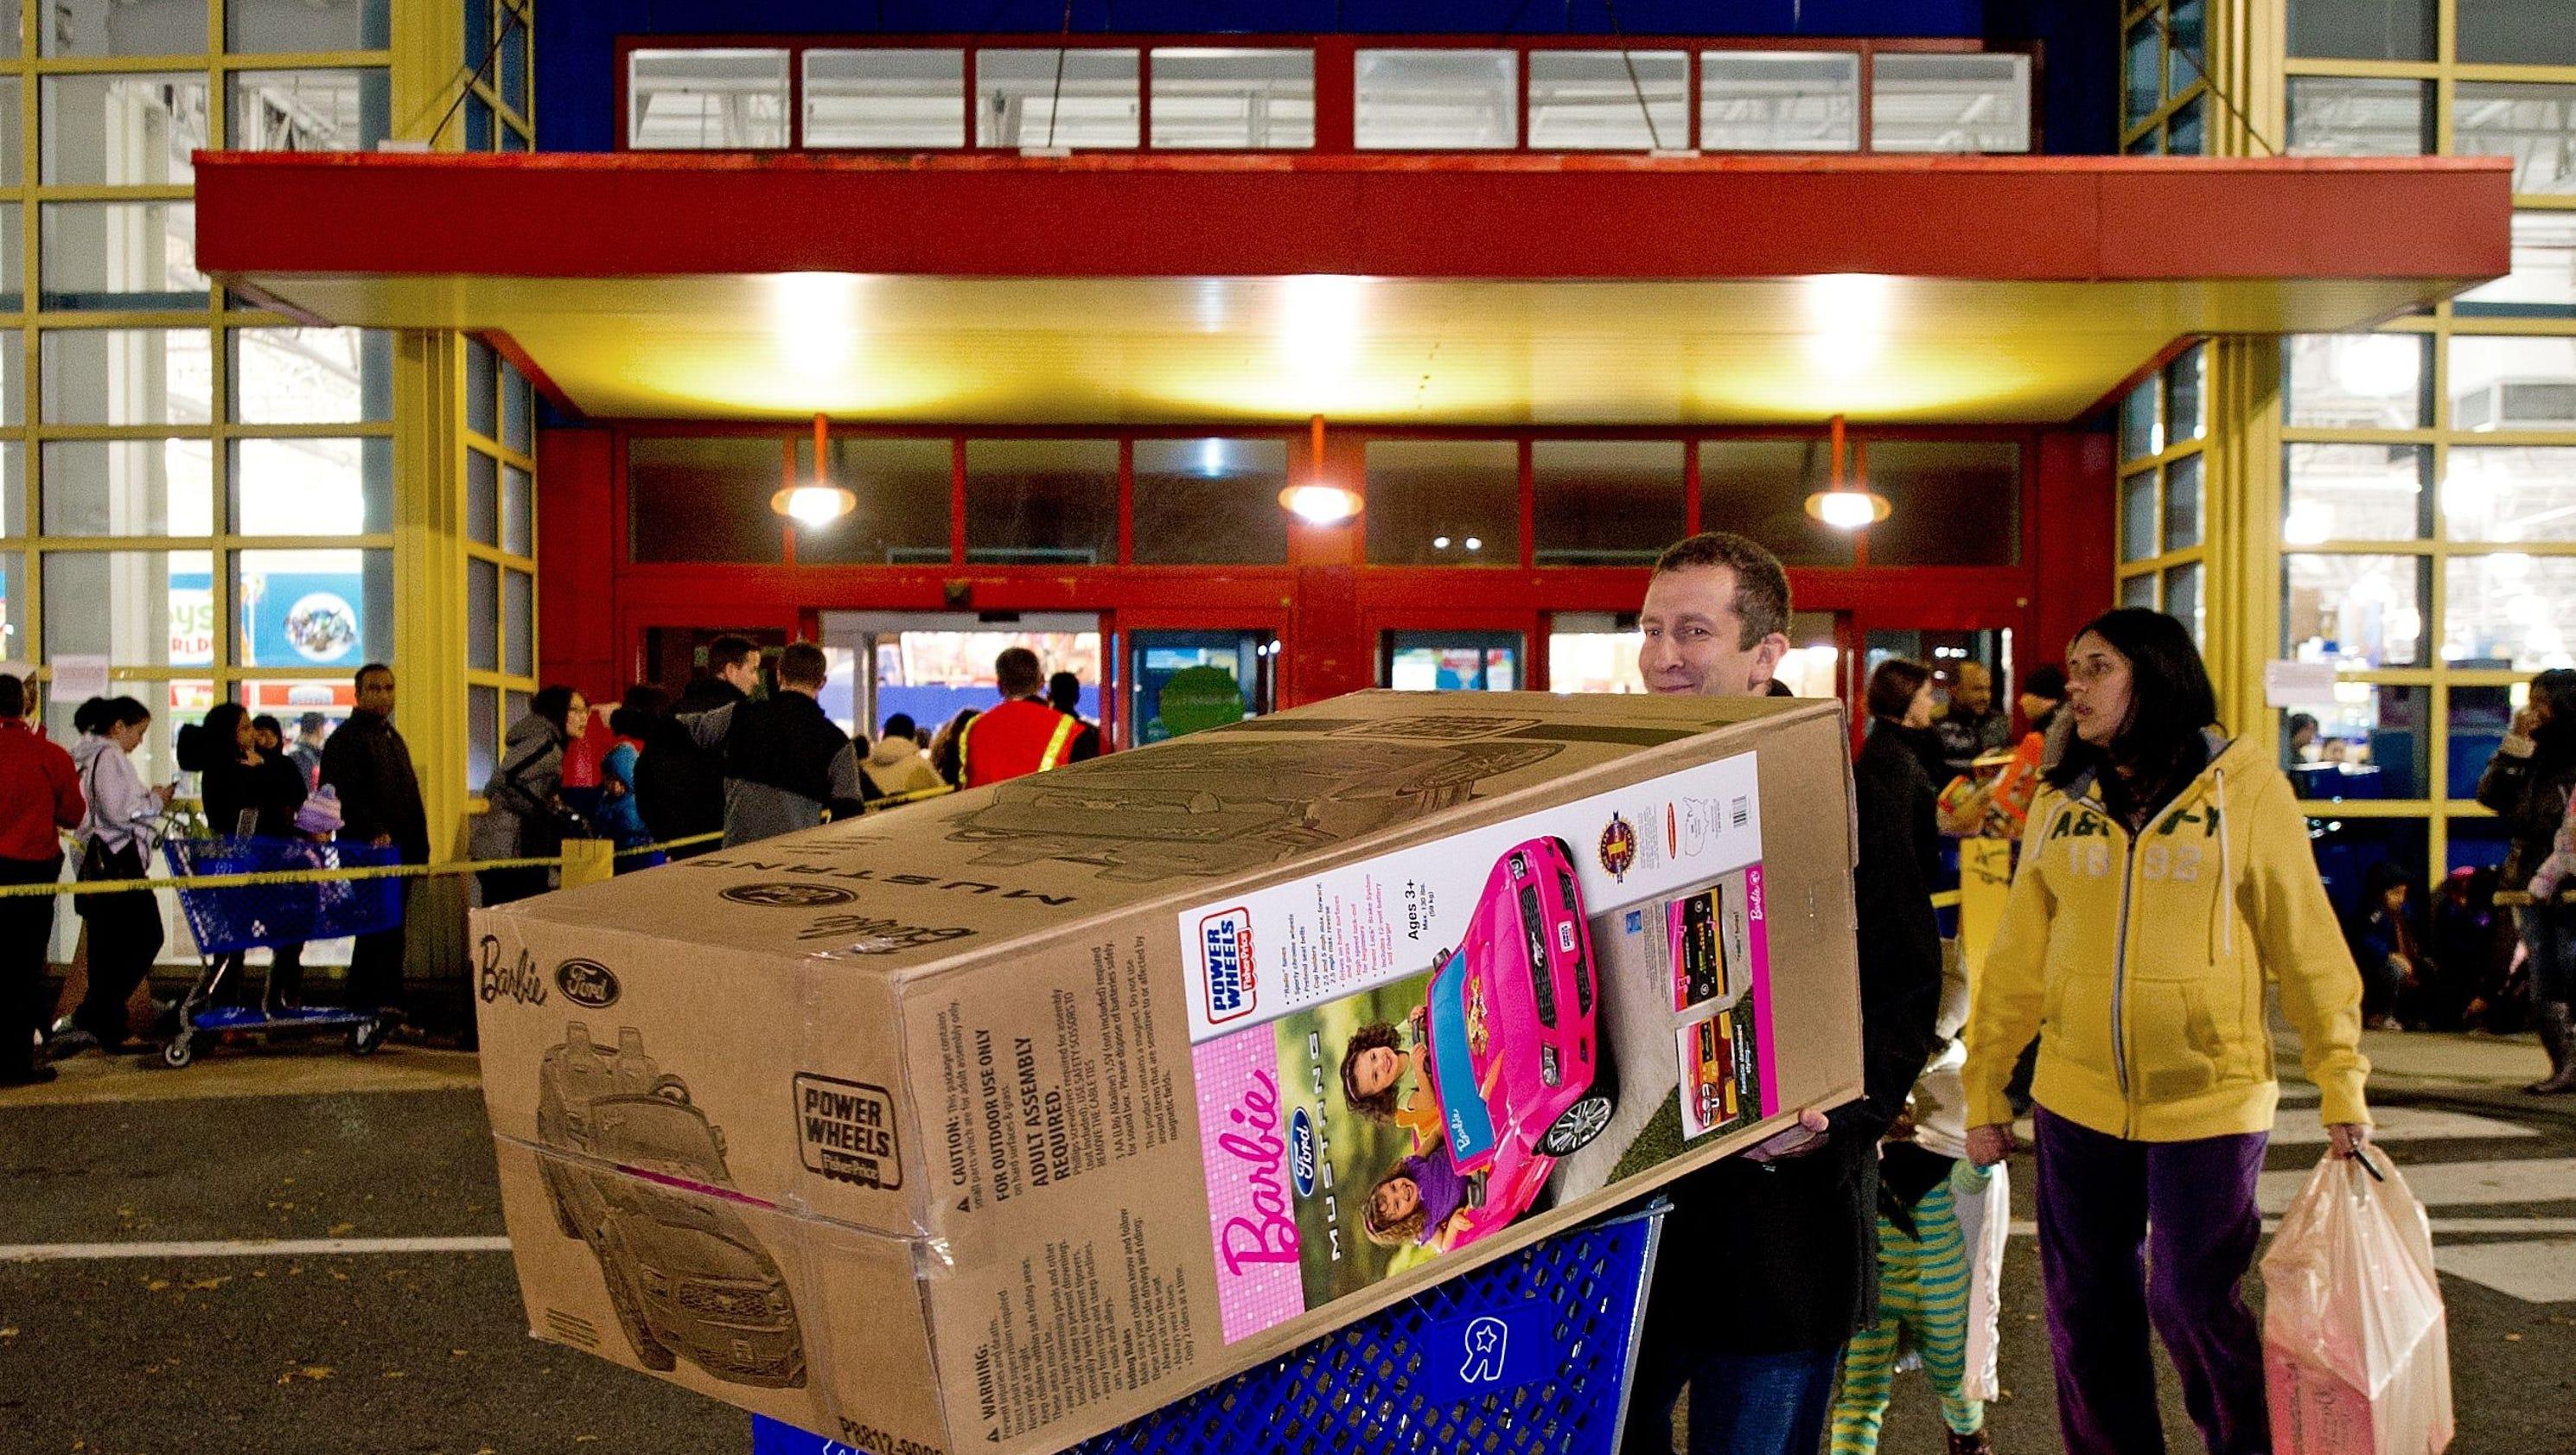 Toys R Us preparing for liquidation, sources say